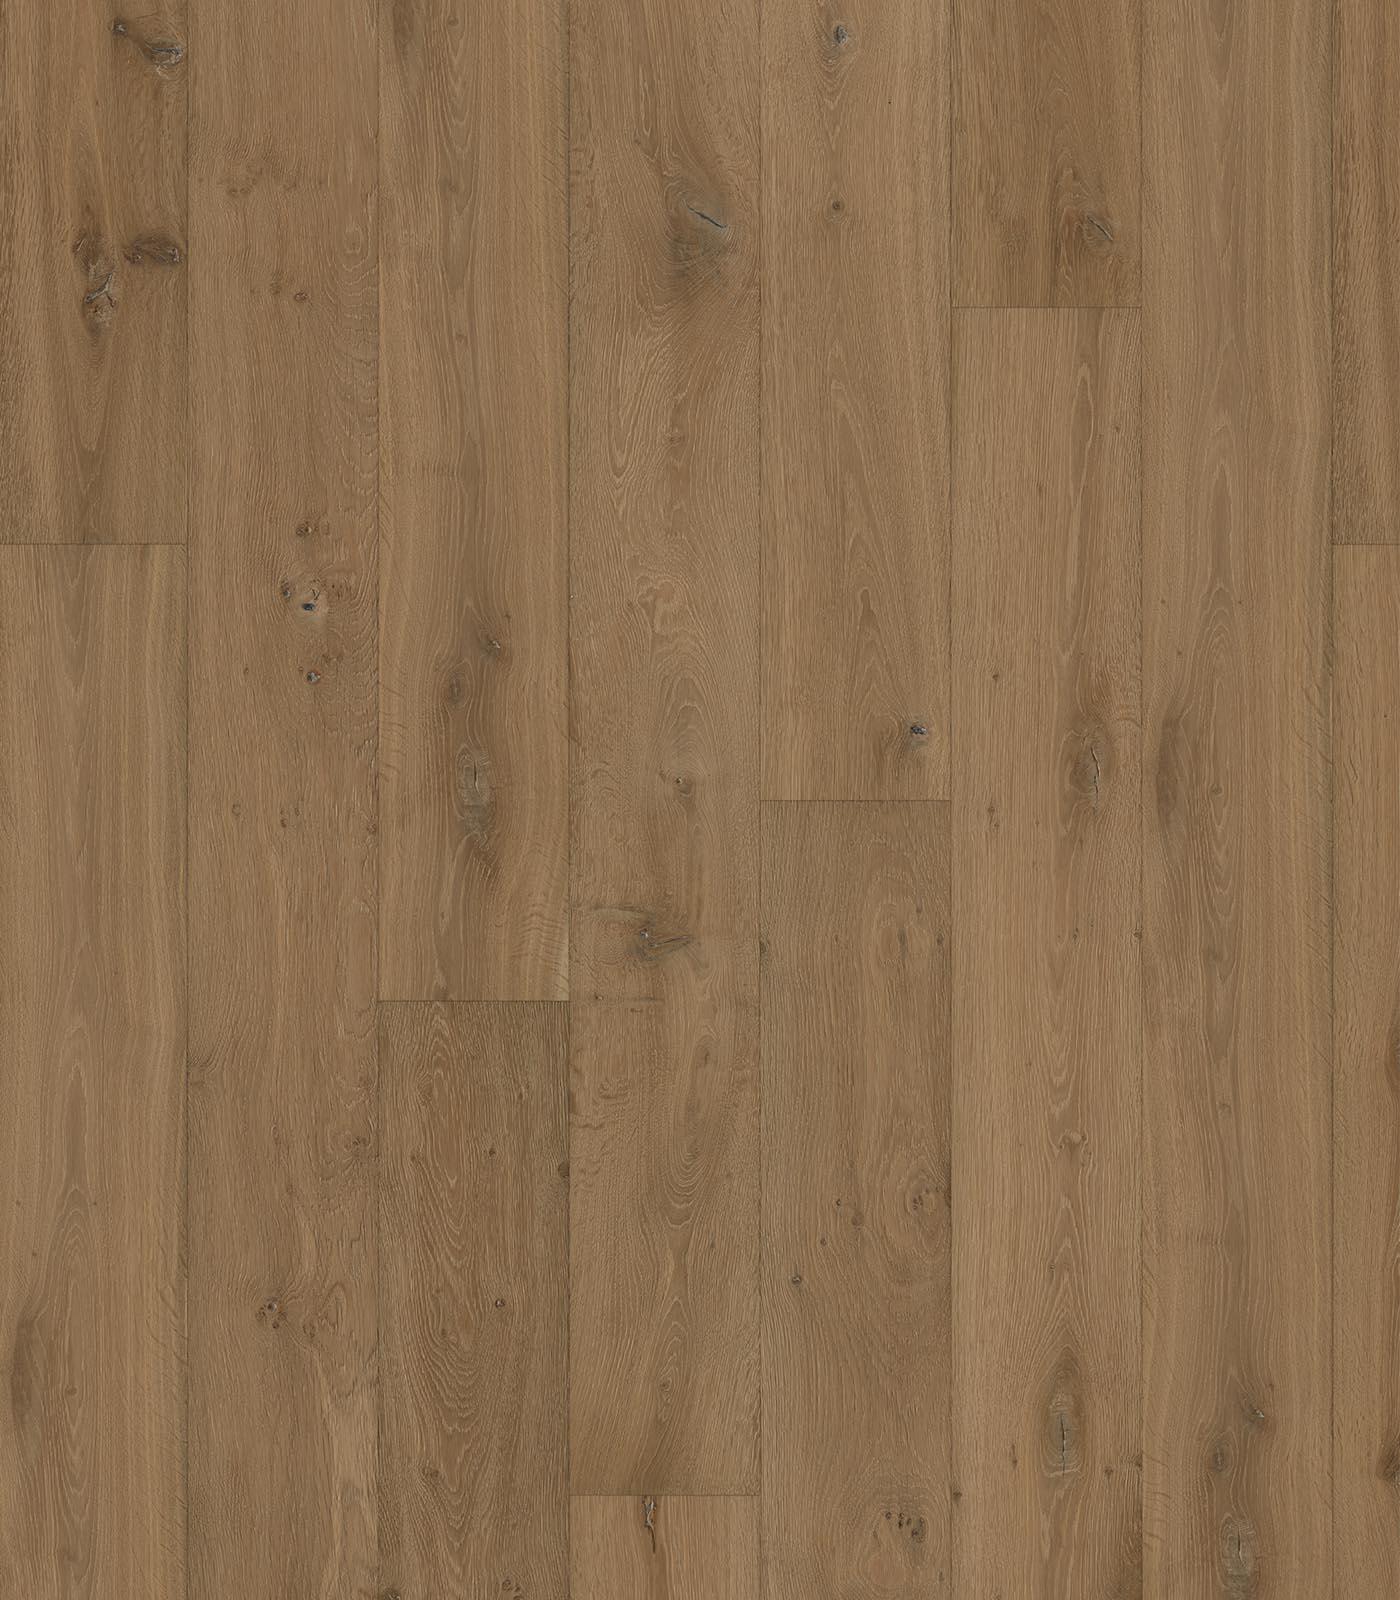 Assisi-European Oak Floors-Heritage Collection-flat